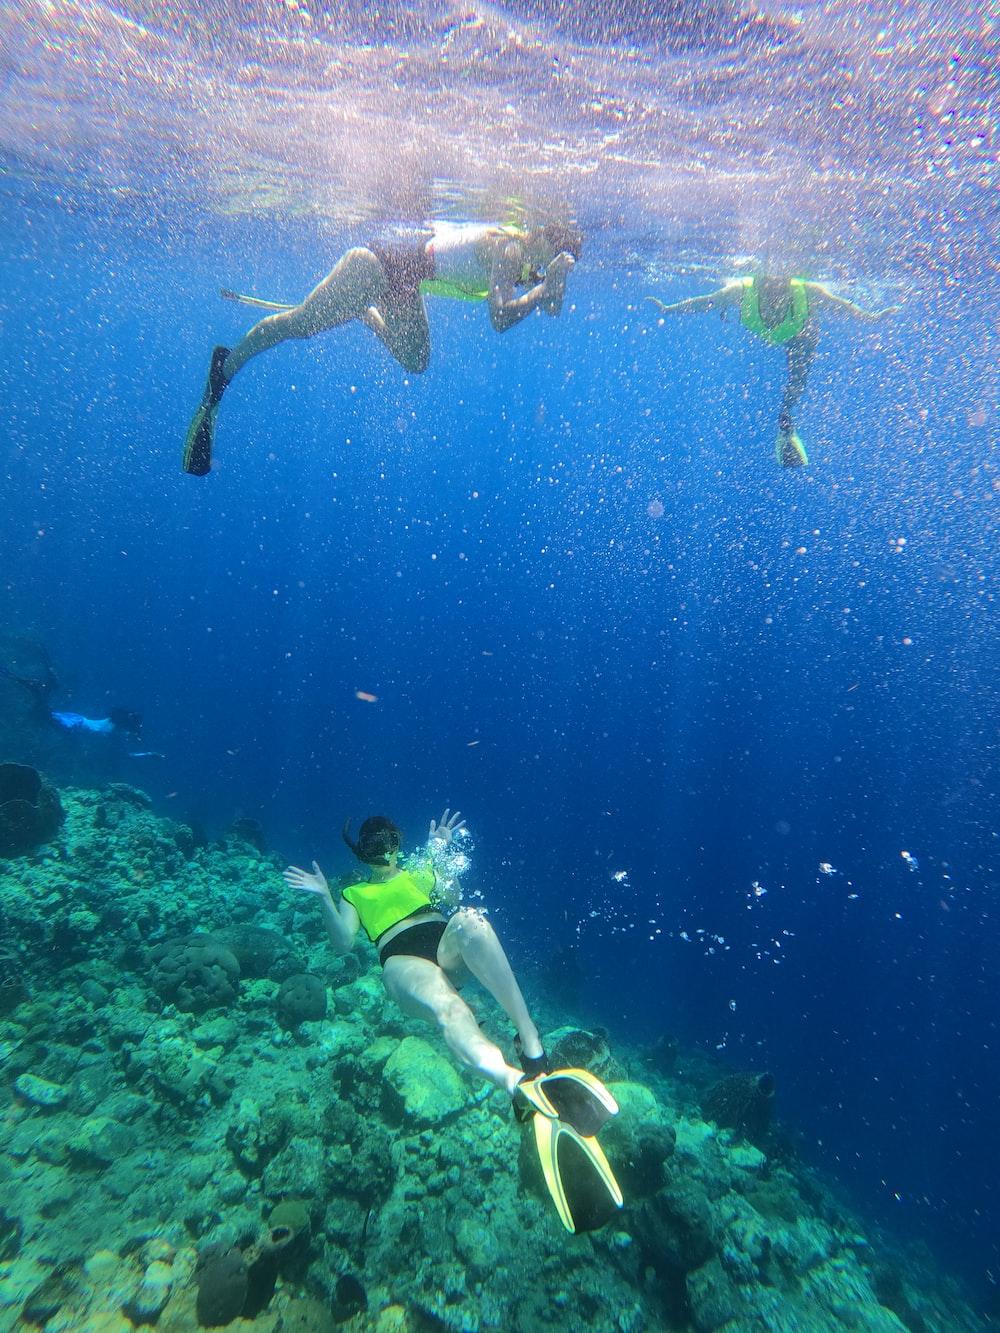 woman in blue and white bikini swimming in the water